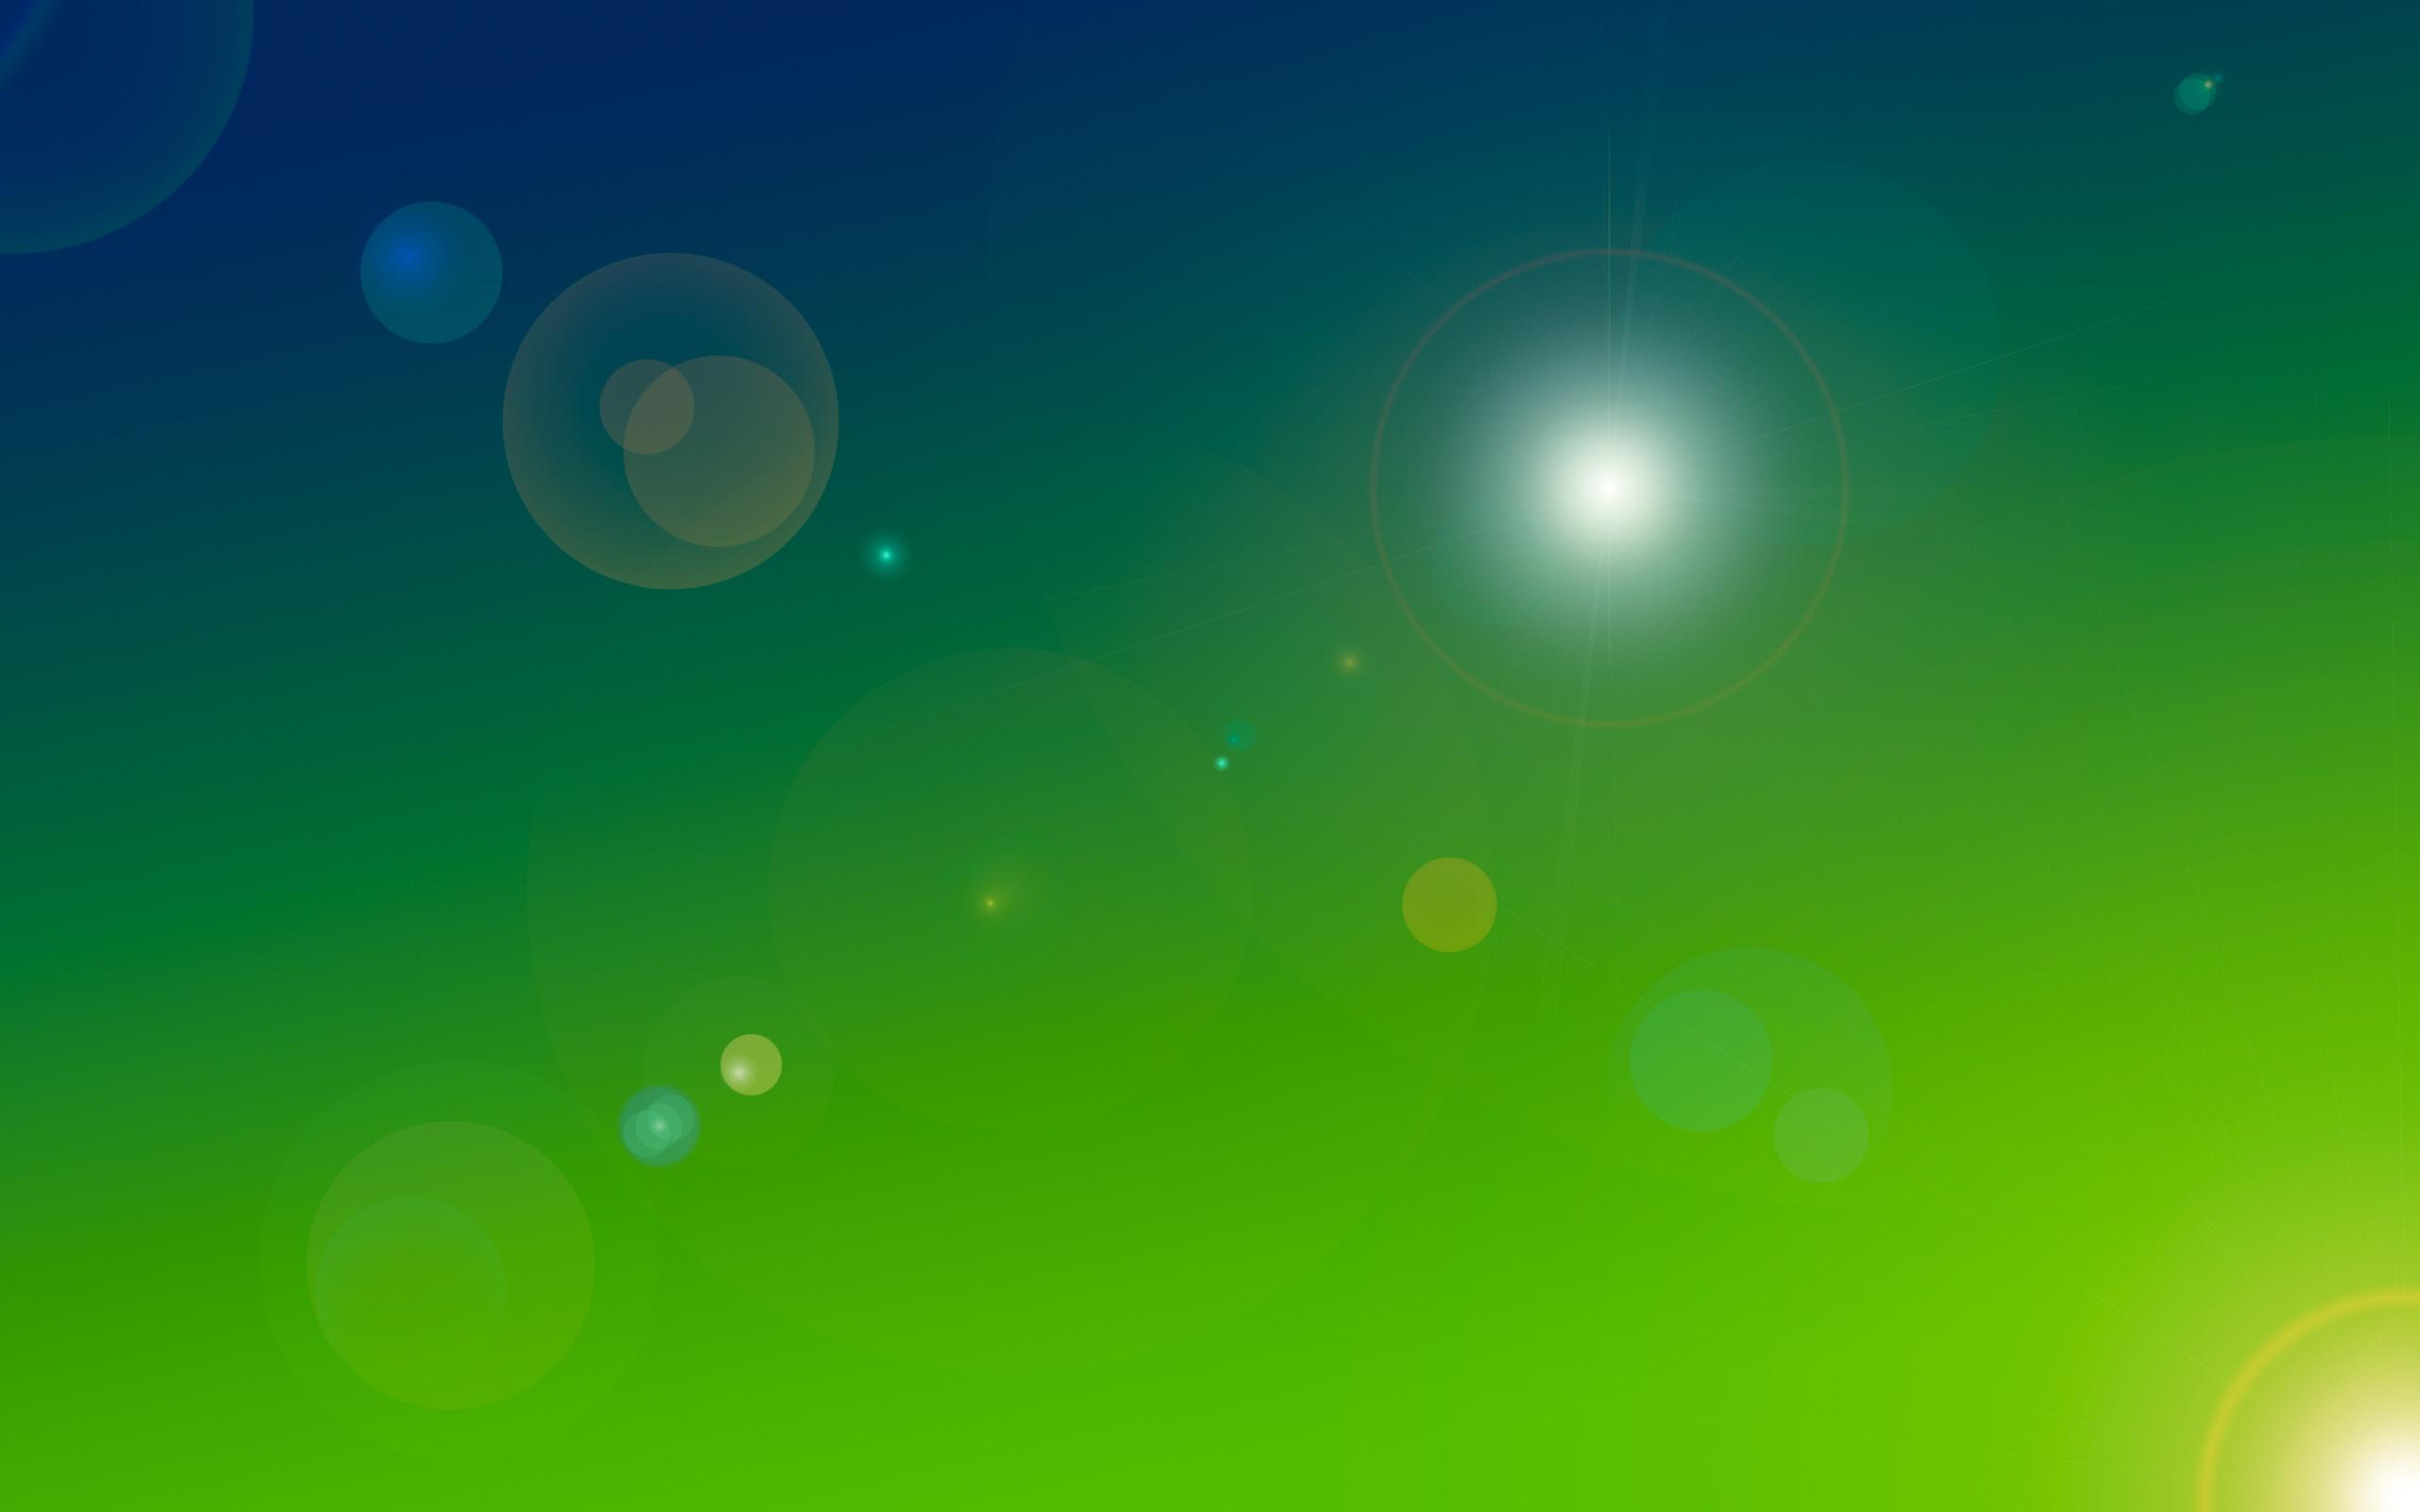 Amazing Blue Green HD Wallpaper Image Background Desktop ... - photo#44